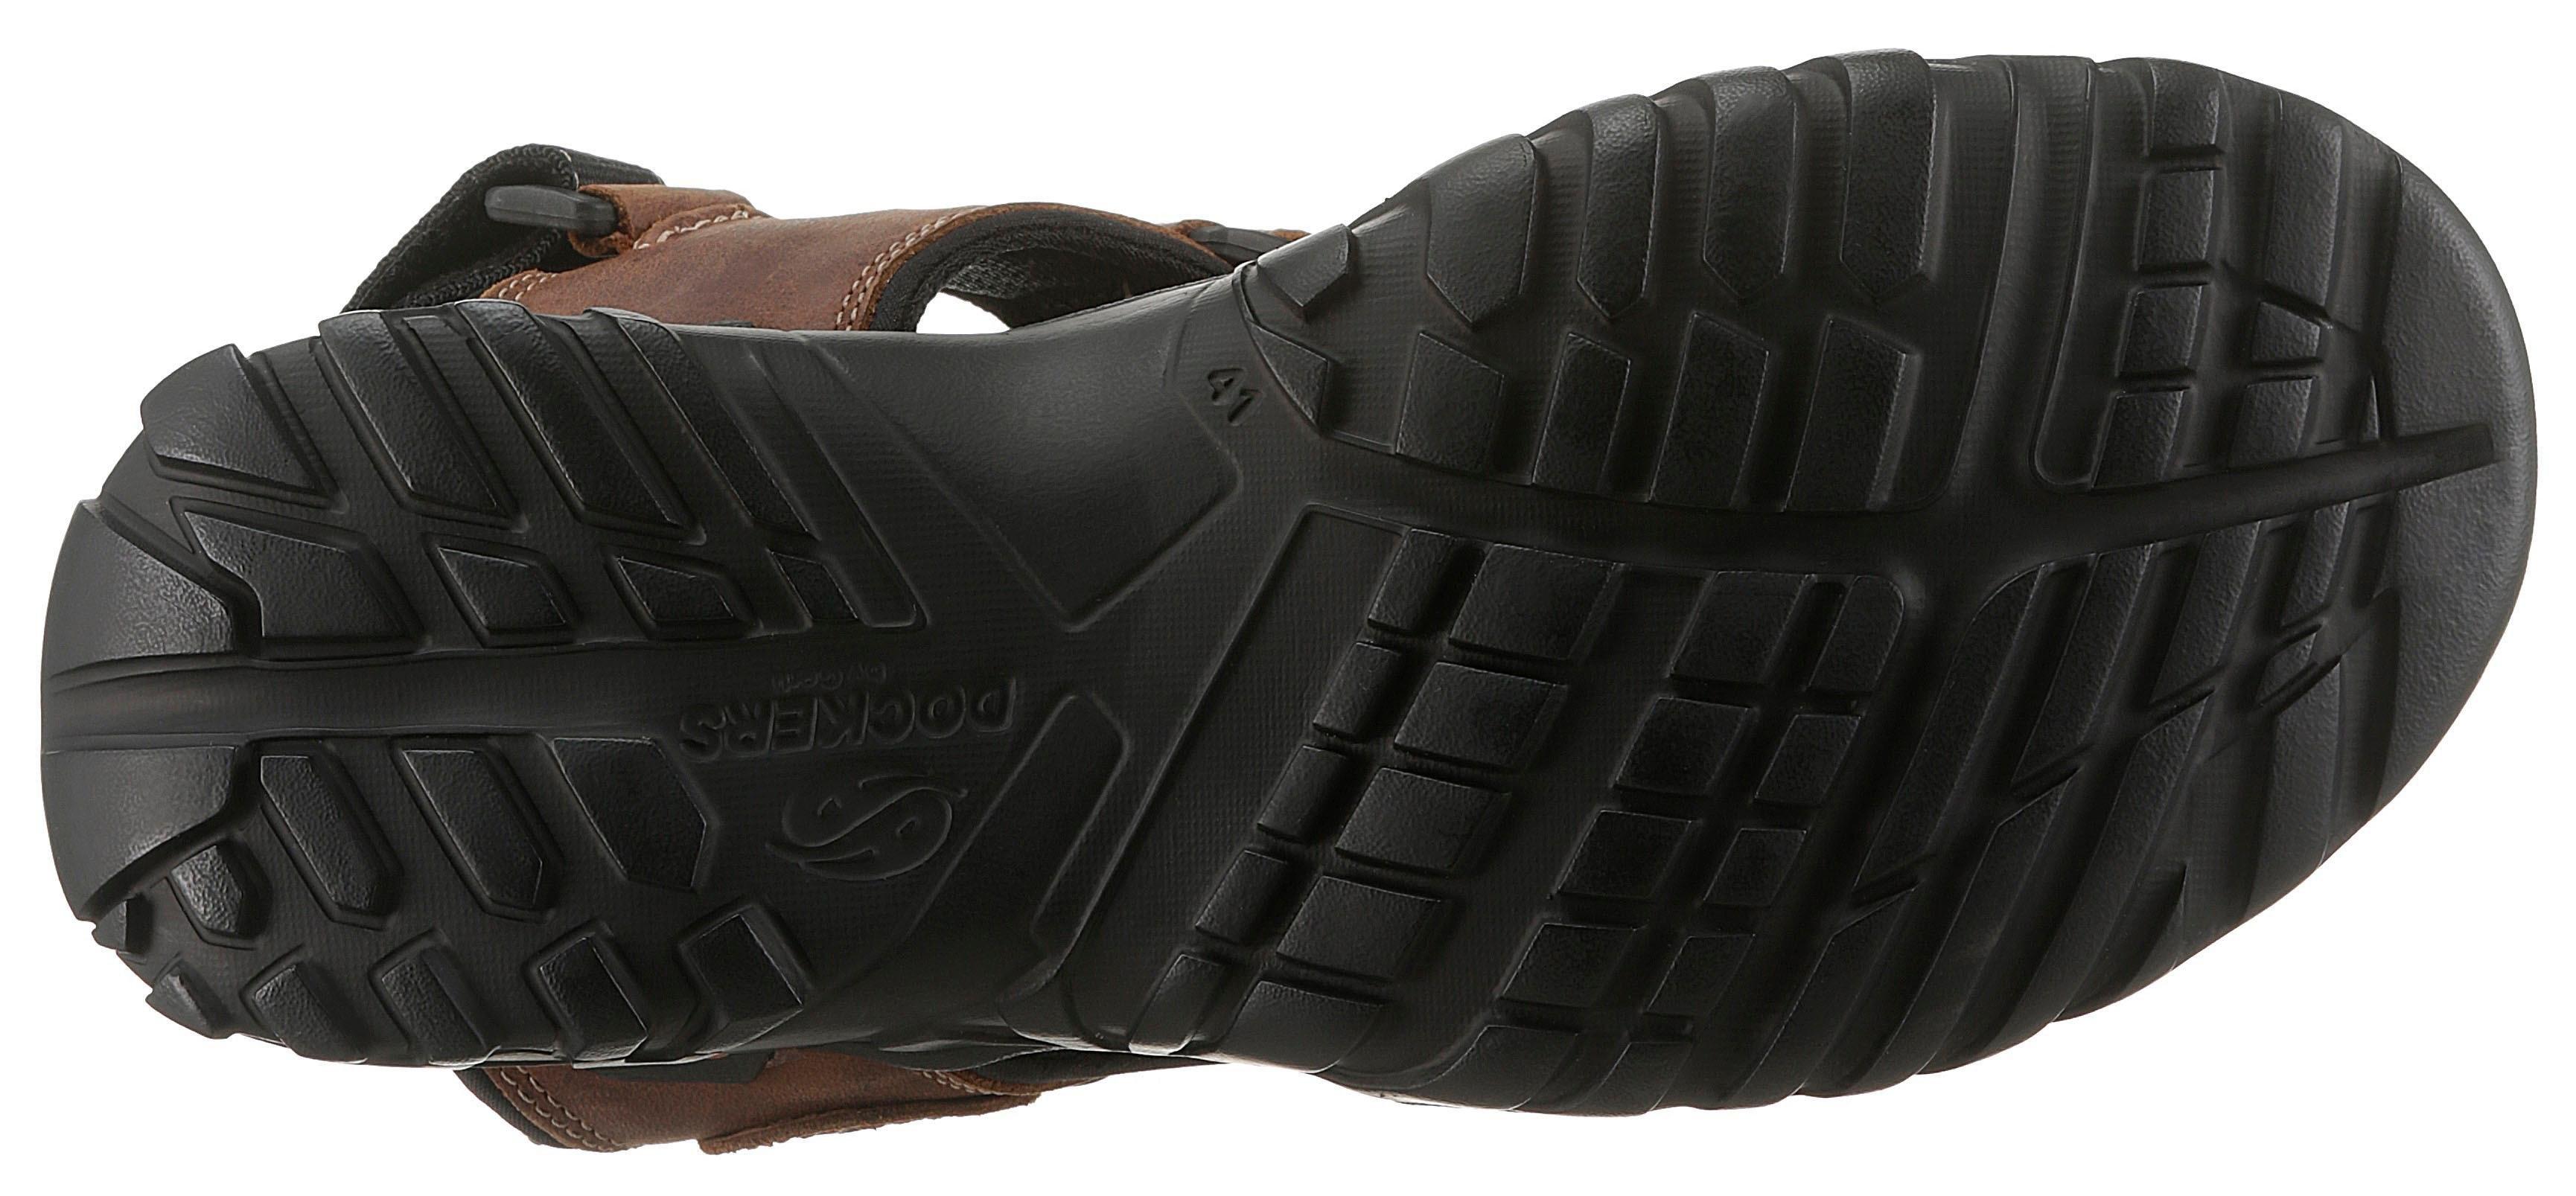 Dockers By Gerli sandalen bestellen: 30 dagen bedenktijd